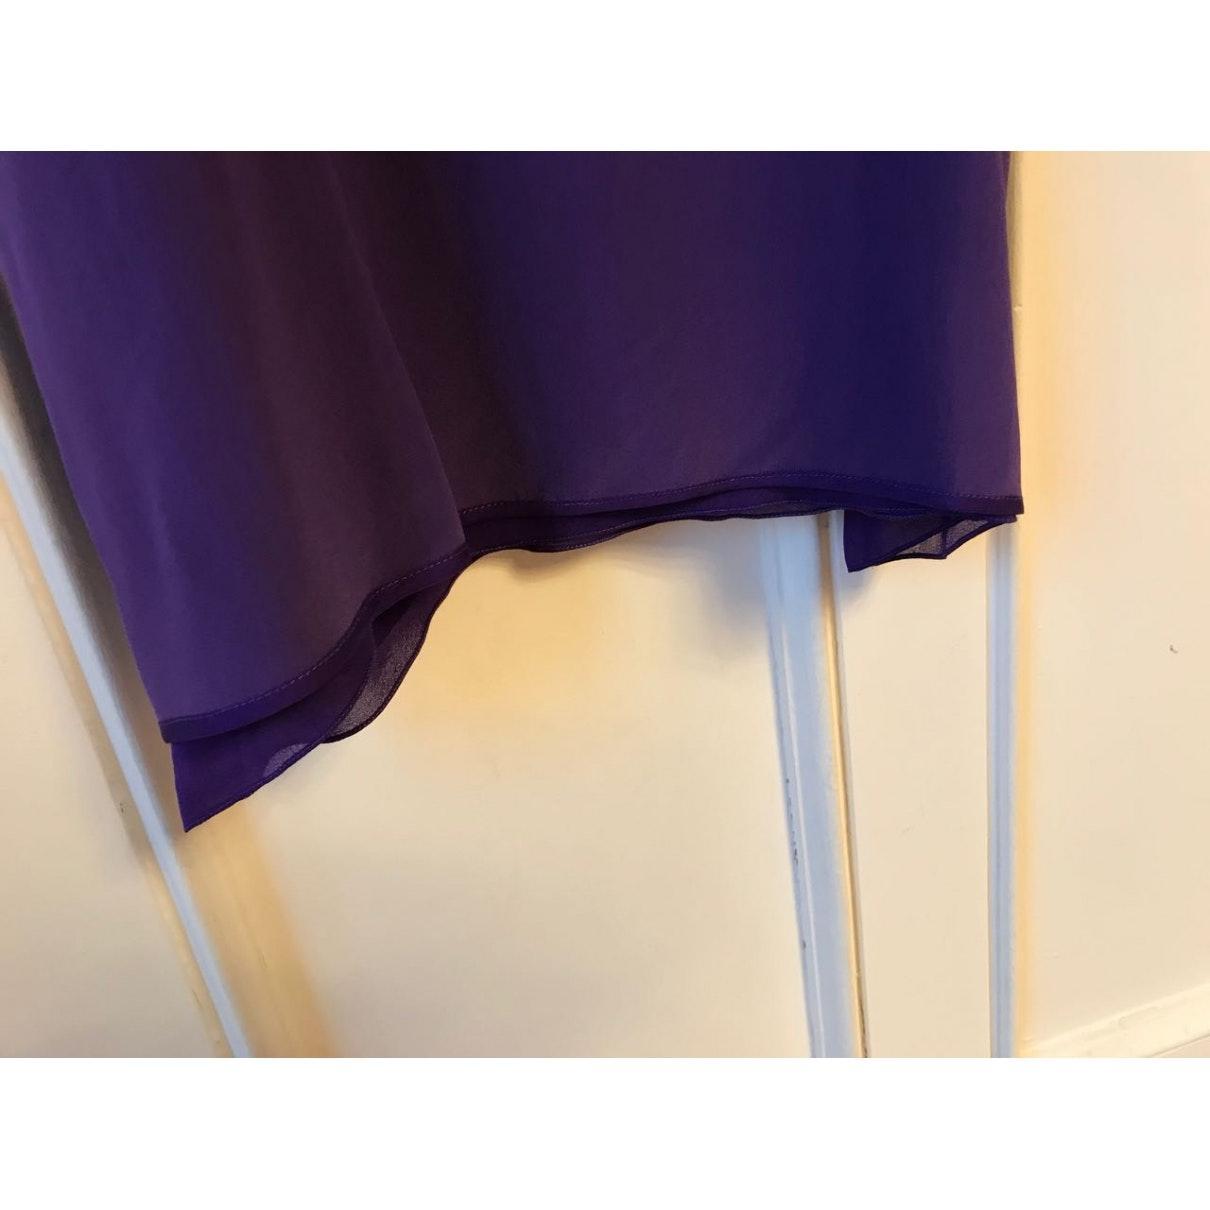 Top N en Soie Violet Chloé en coloris Violet